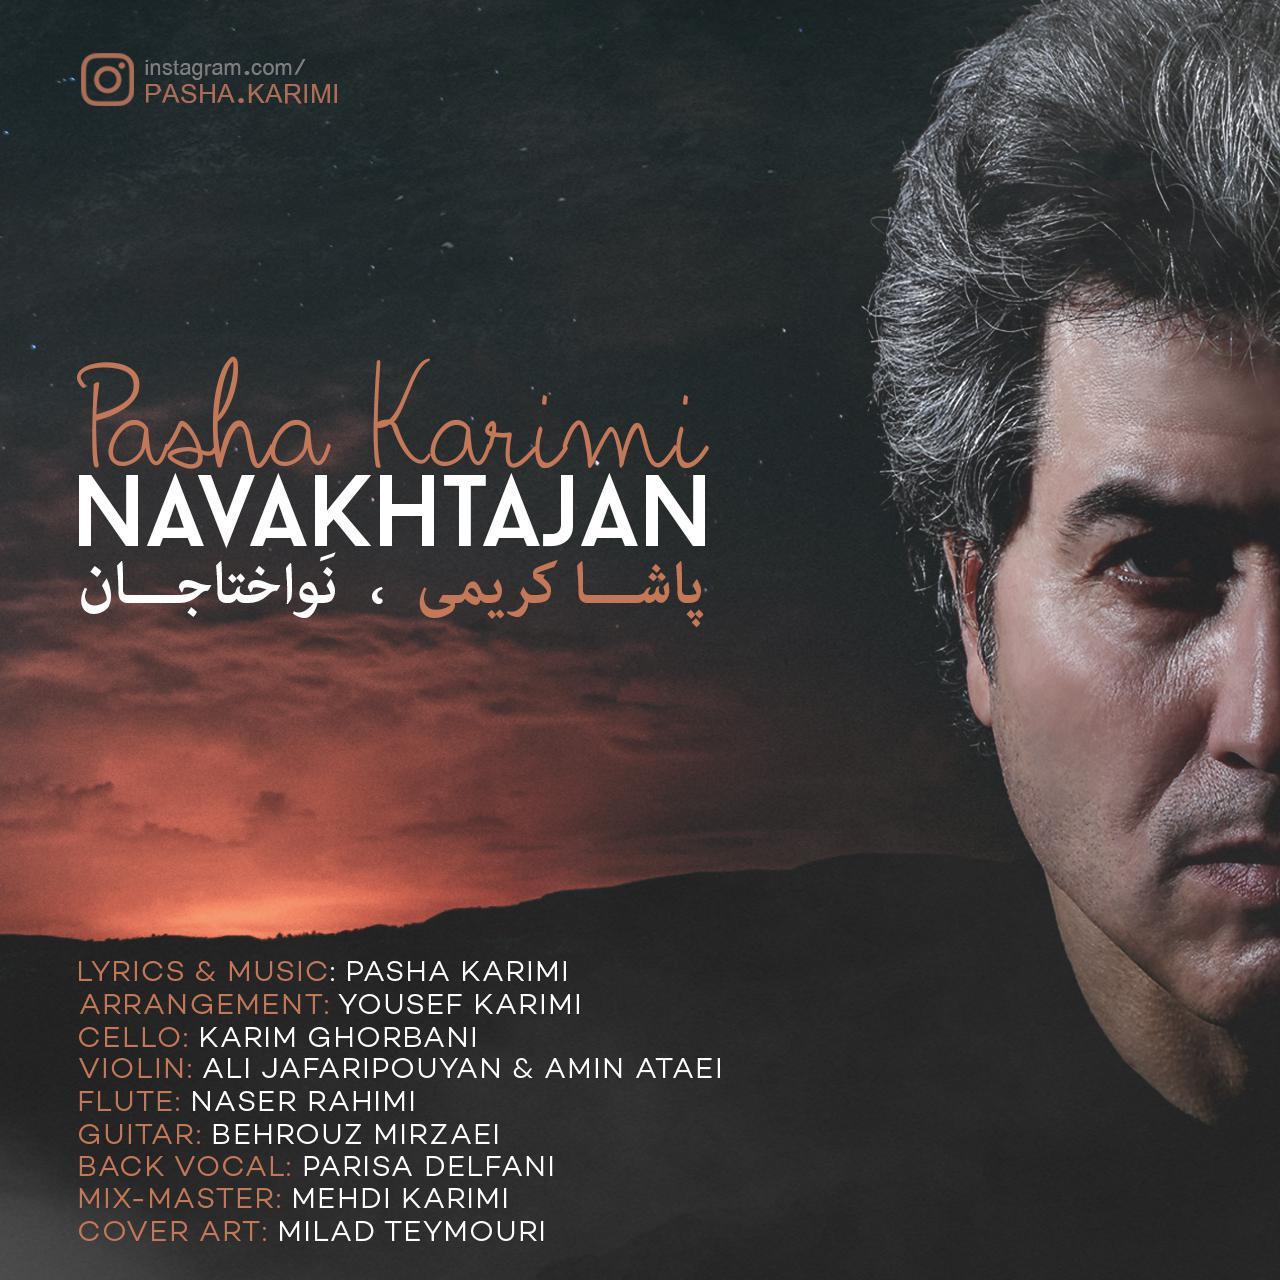 http://s8.picofile.com/file/8323619034/53Pasha_Karimi_Navakhtajan.jpg